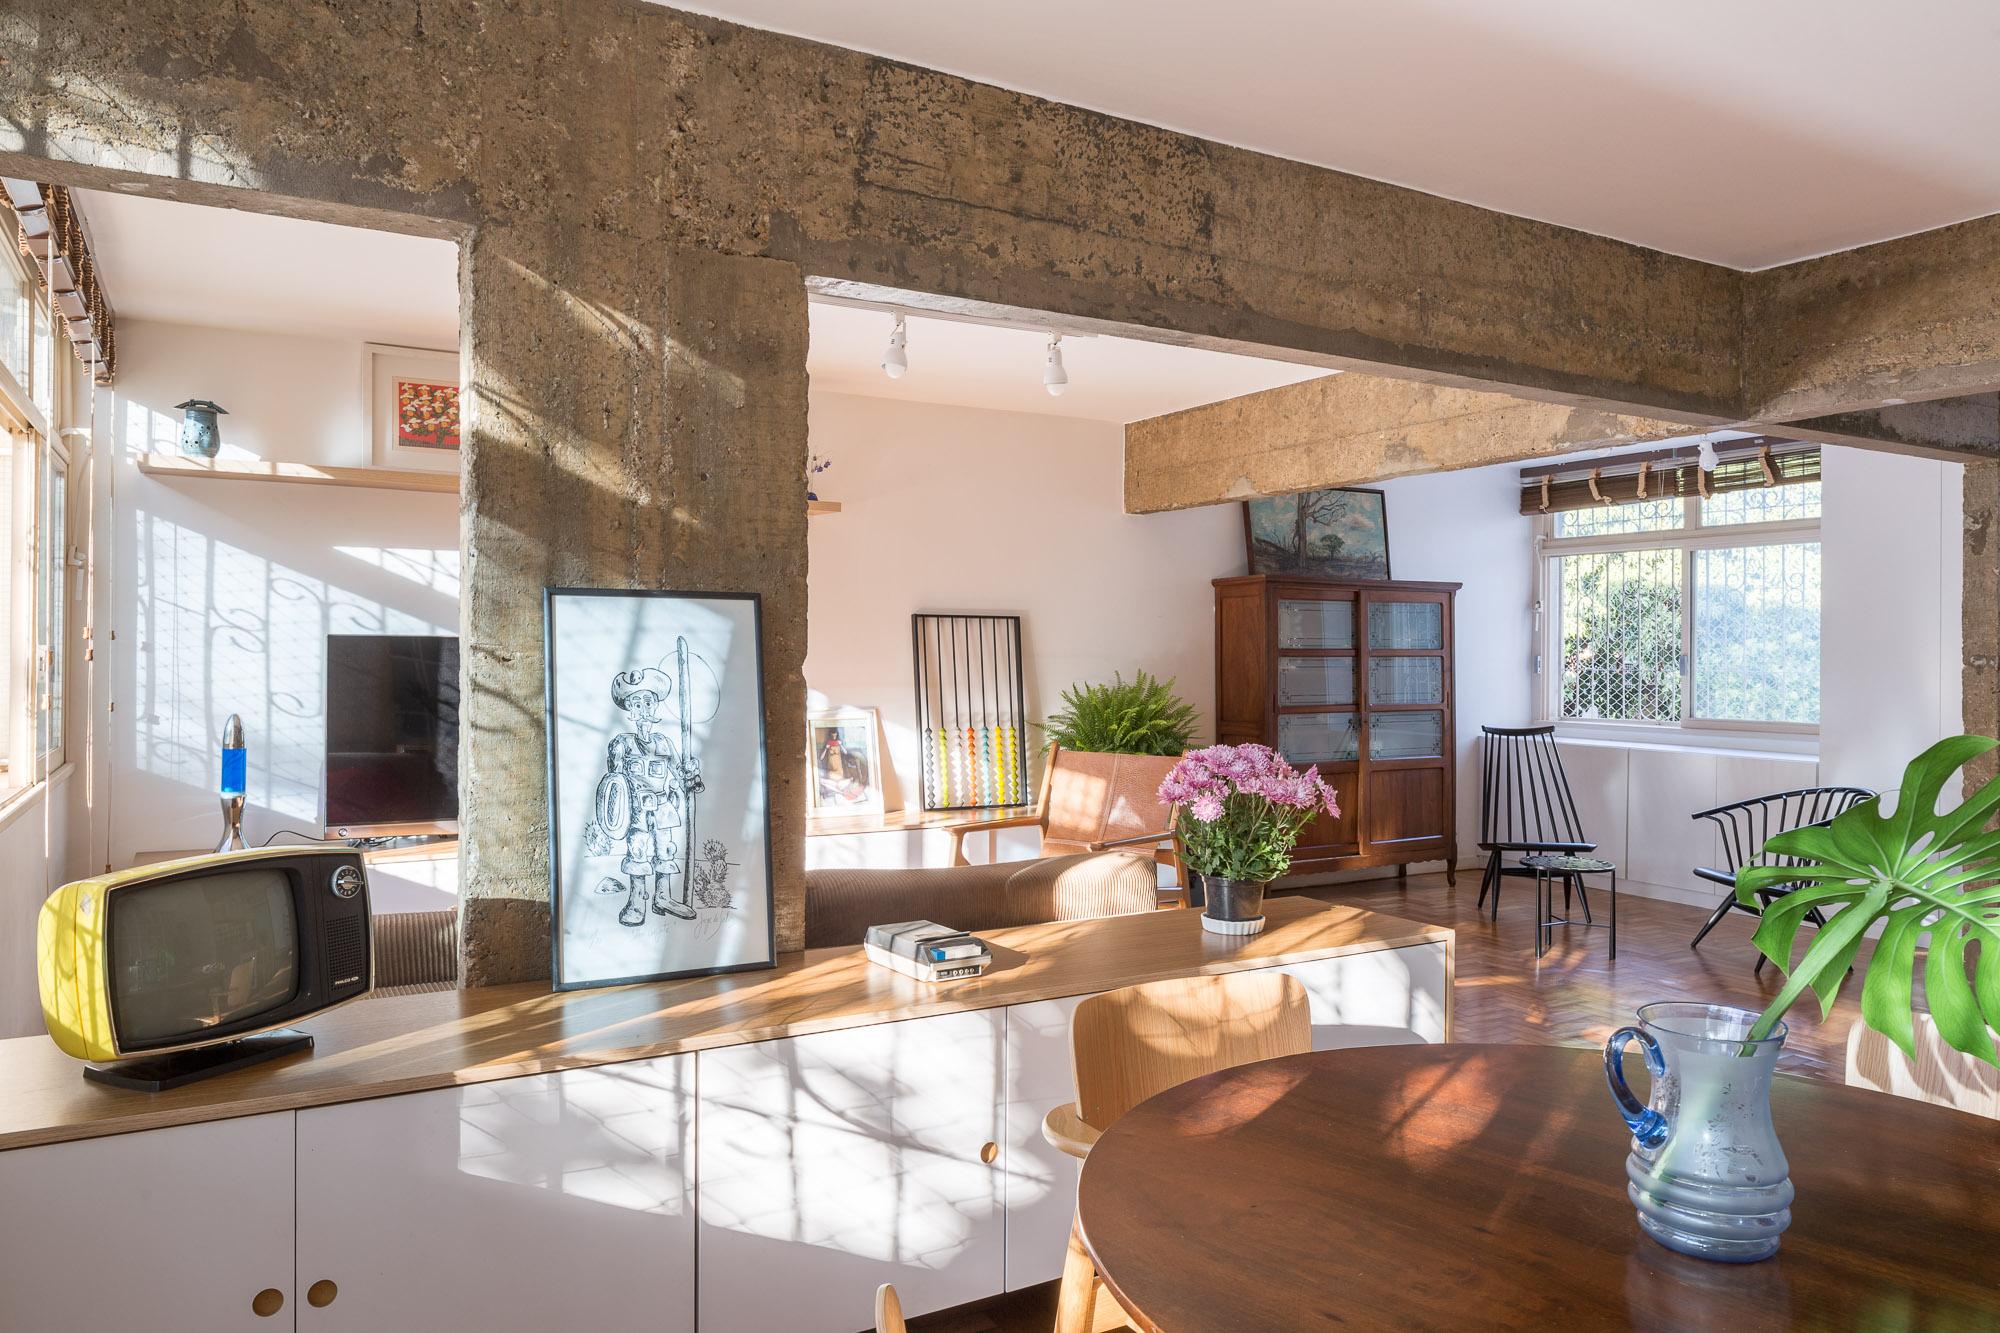 170804_Apartamento_Bauru_111-HDR.jpg